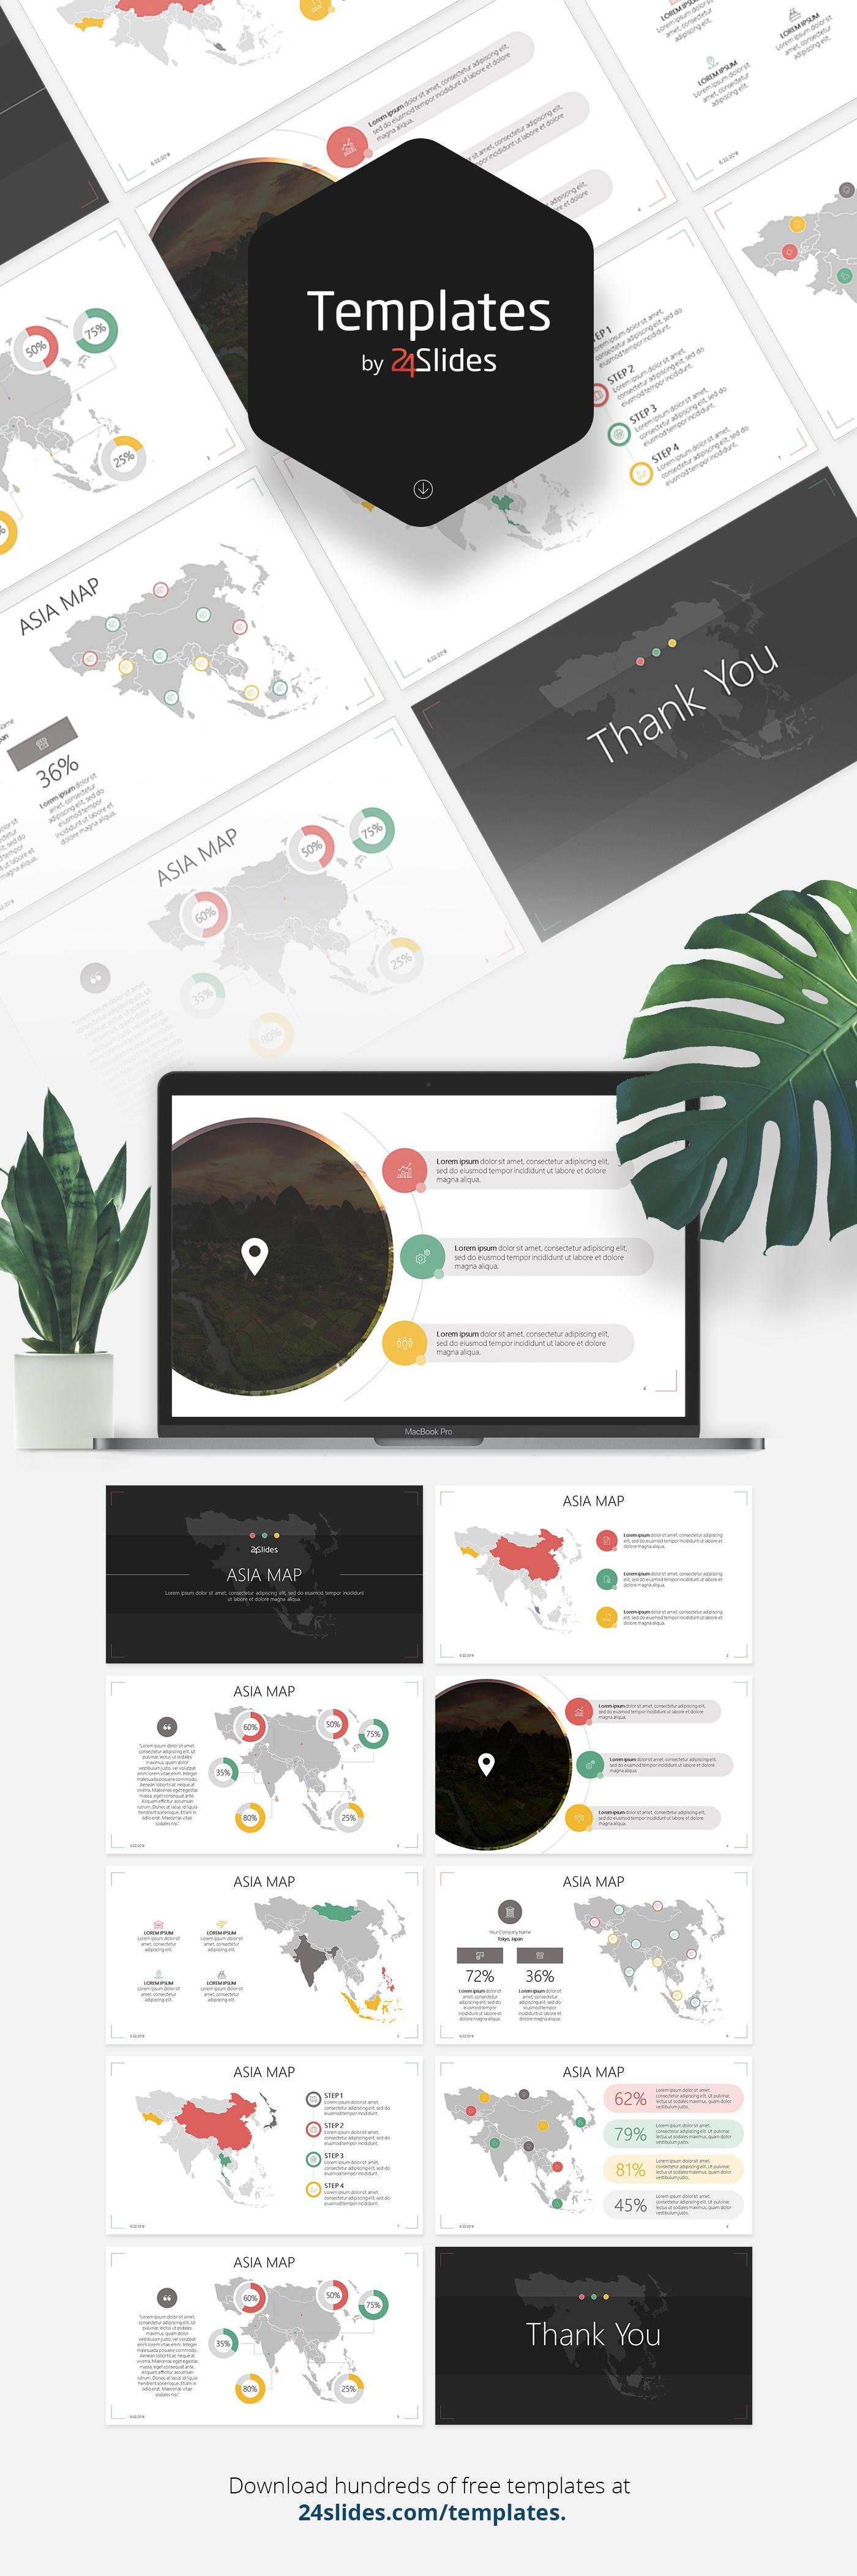 free,Keynote,modern,corporatebranding,brandingstrategy,download,corporateidentity,corporatedesign,presenting